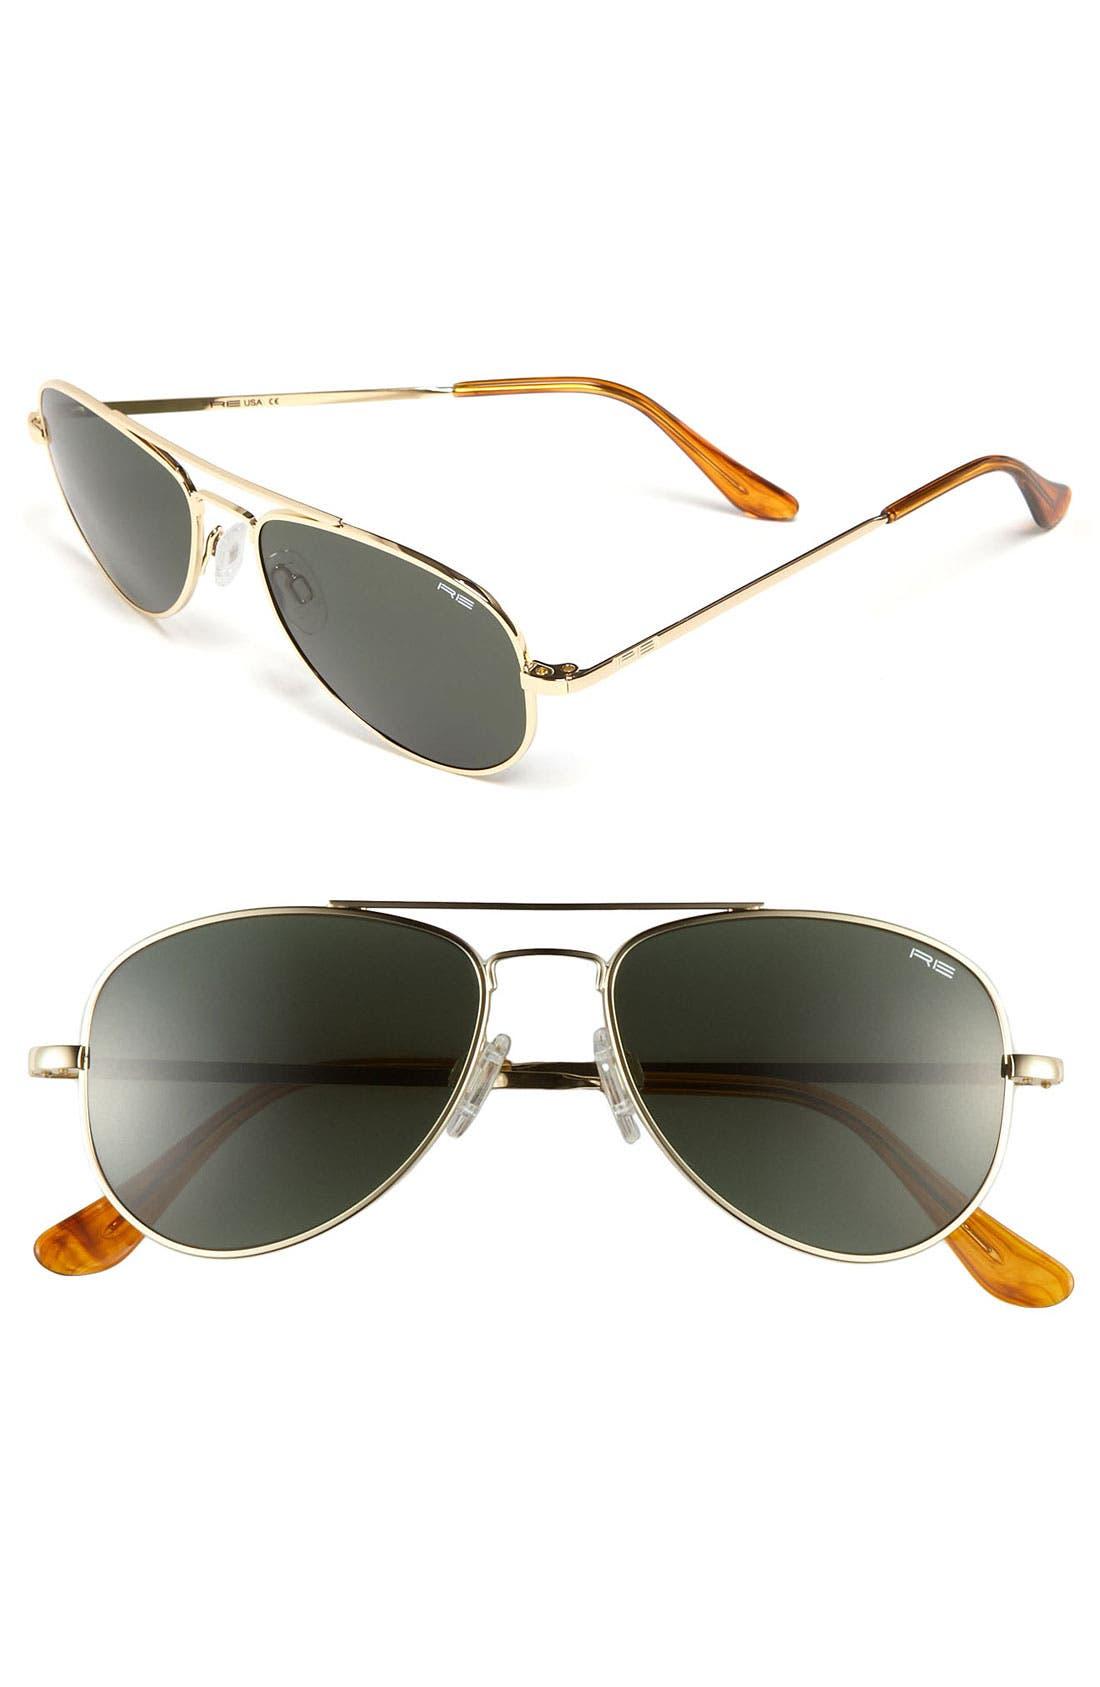 Main Image - Randolph Engineering 'Concorde Classic' 52mm Sunglasses